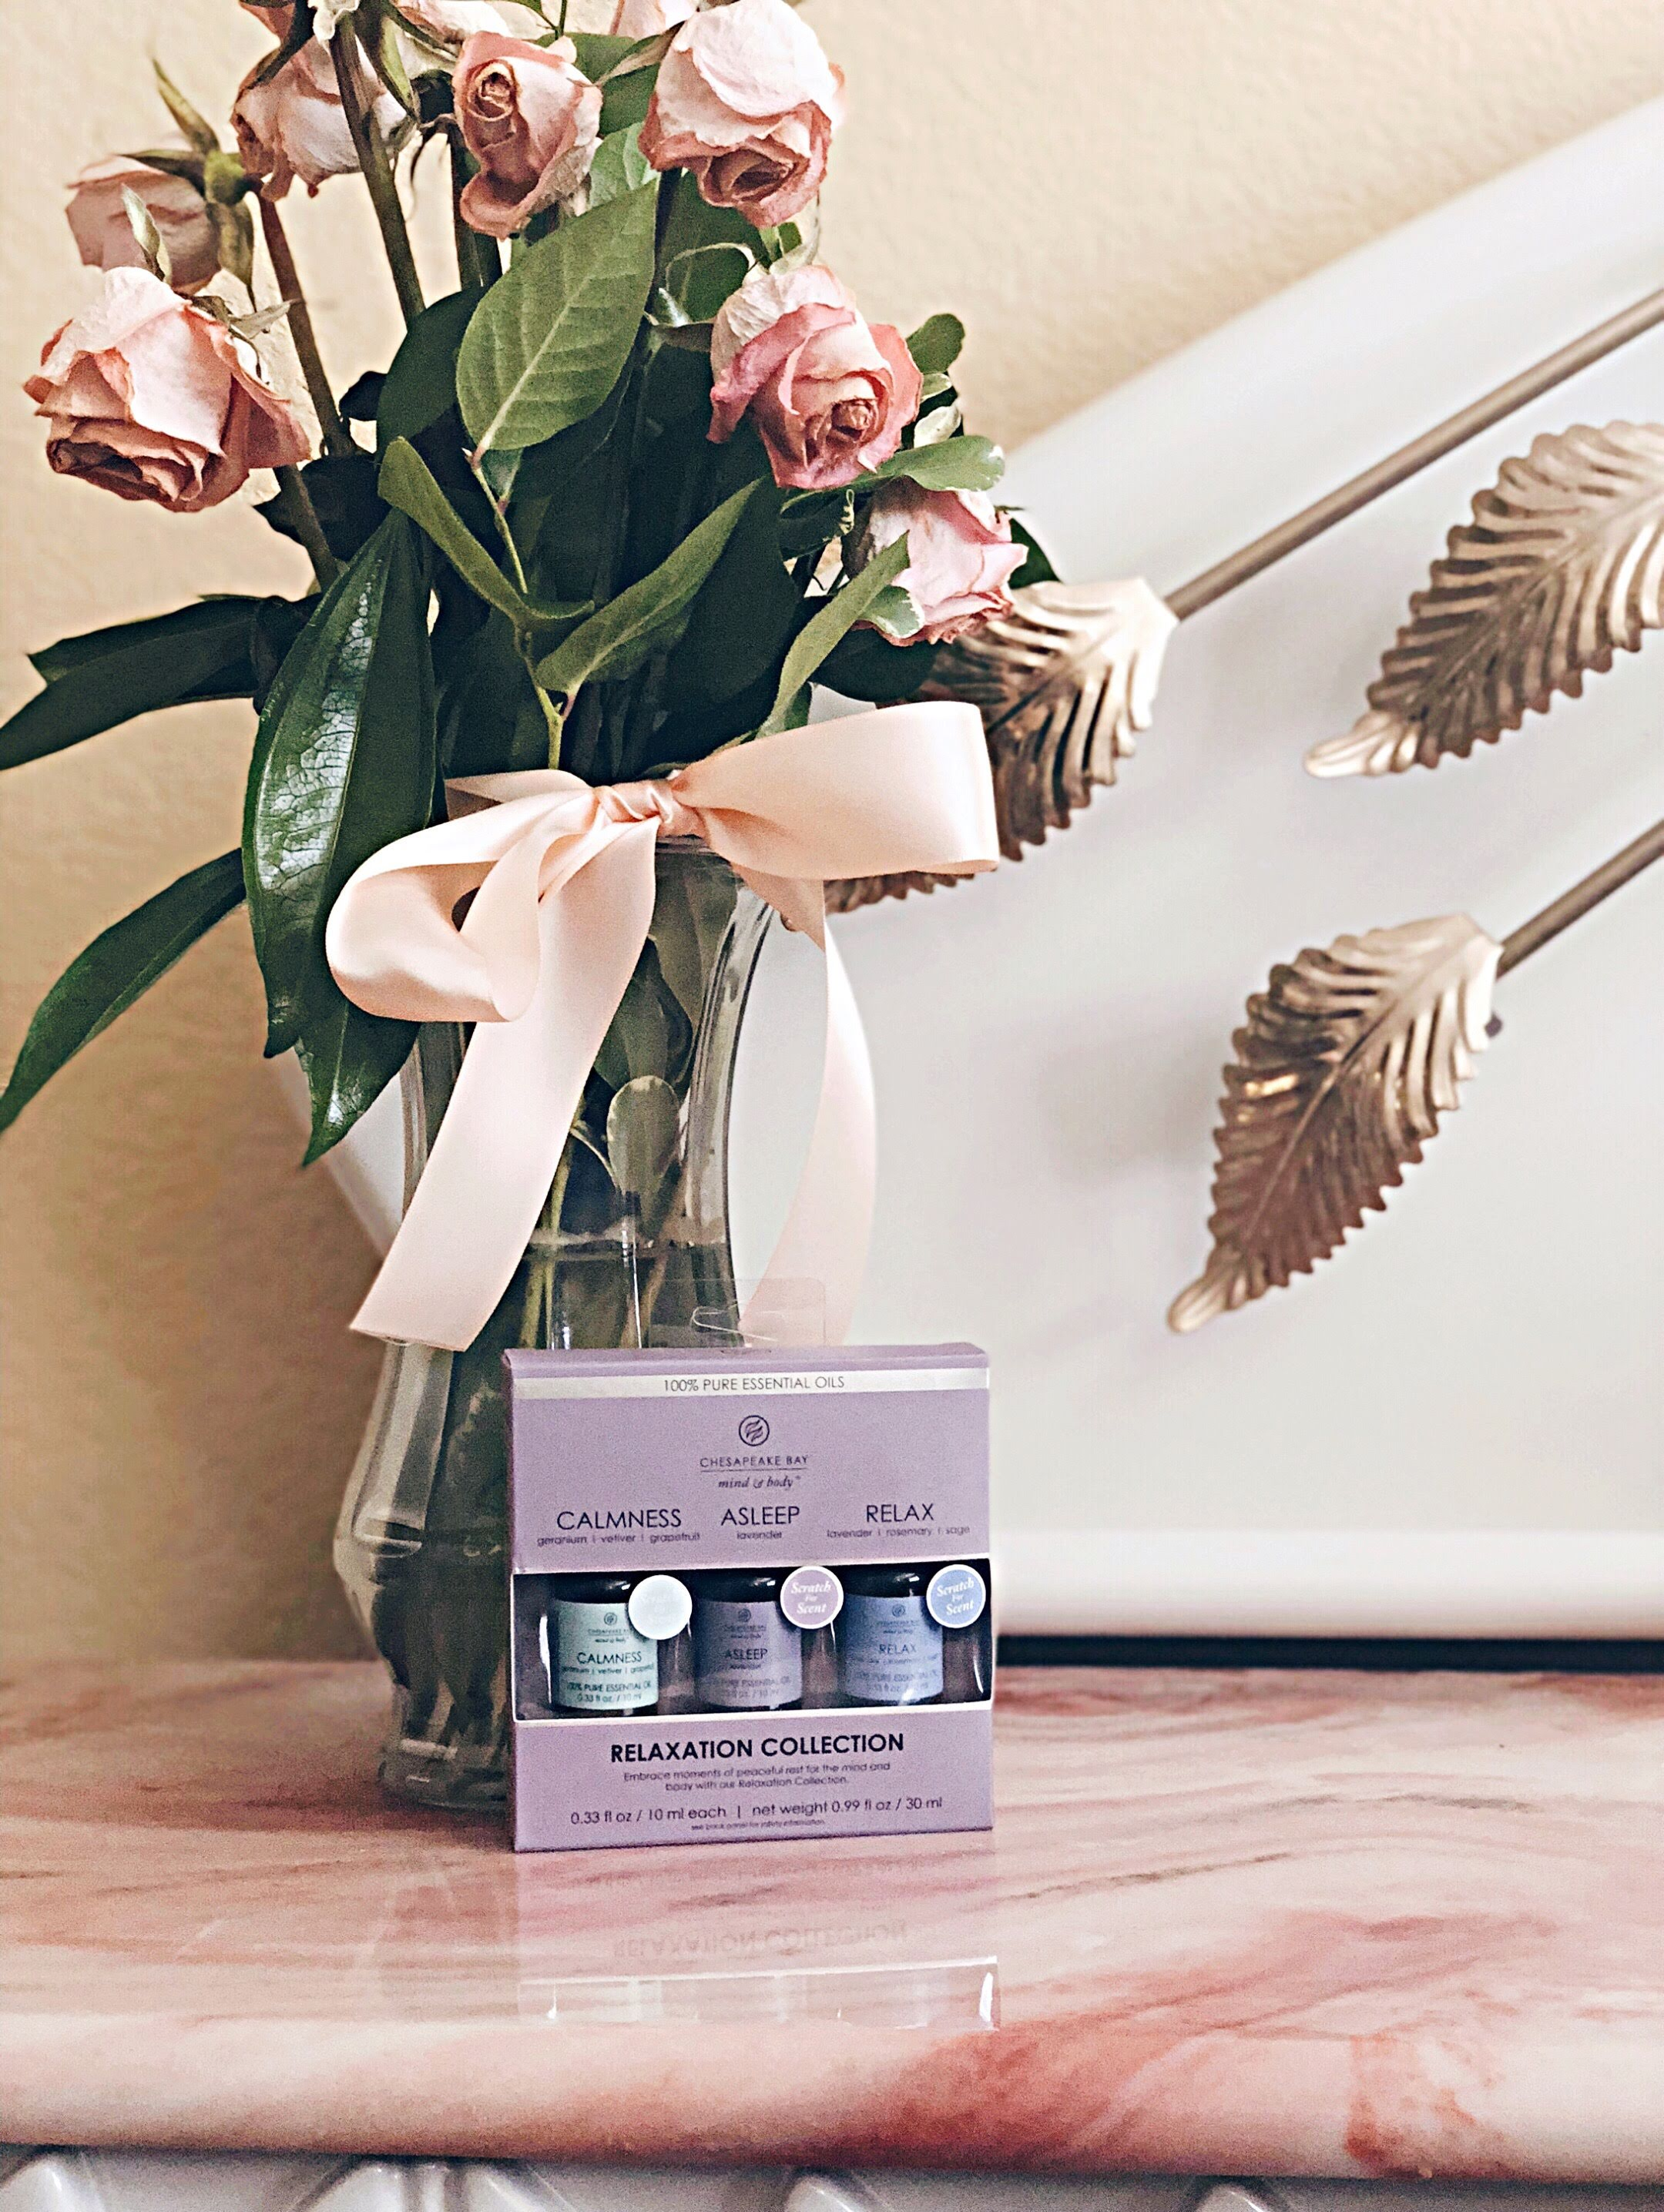 Relaxation Collection - Find your inner wellness & stimulate your sensesBalancing—Purifying—RelaxingCALMNESSLemon, Bergamot, Sweet Orange, Clove, Grapefruit, Petitgrain, Lavender, Vetiver, Ginger, Fir, Cinnamon, Geranium.ASLEEPLavenderRELAXSage, Rosemary, Cedarwood, Lavender, Patchouli, Clary Sage, Chamomile